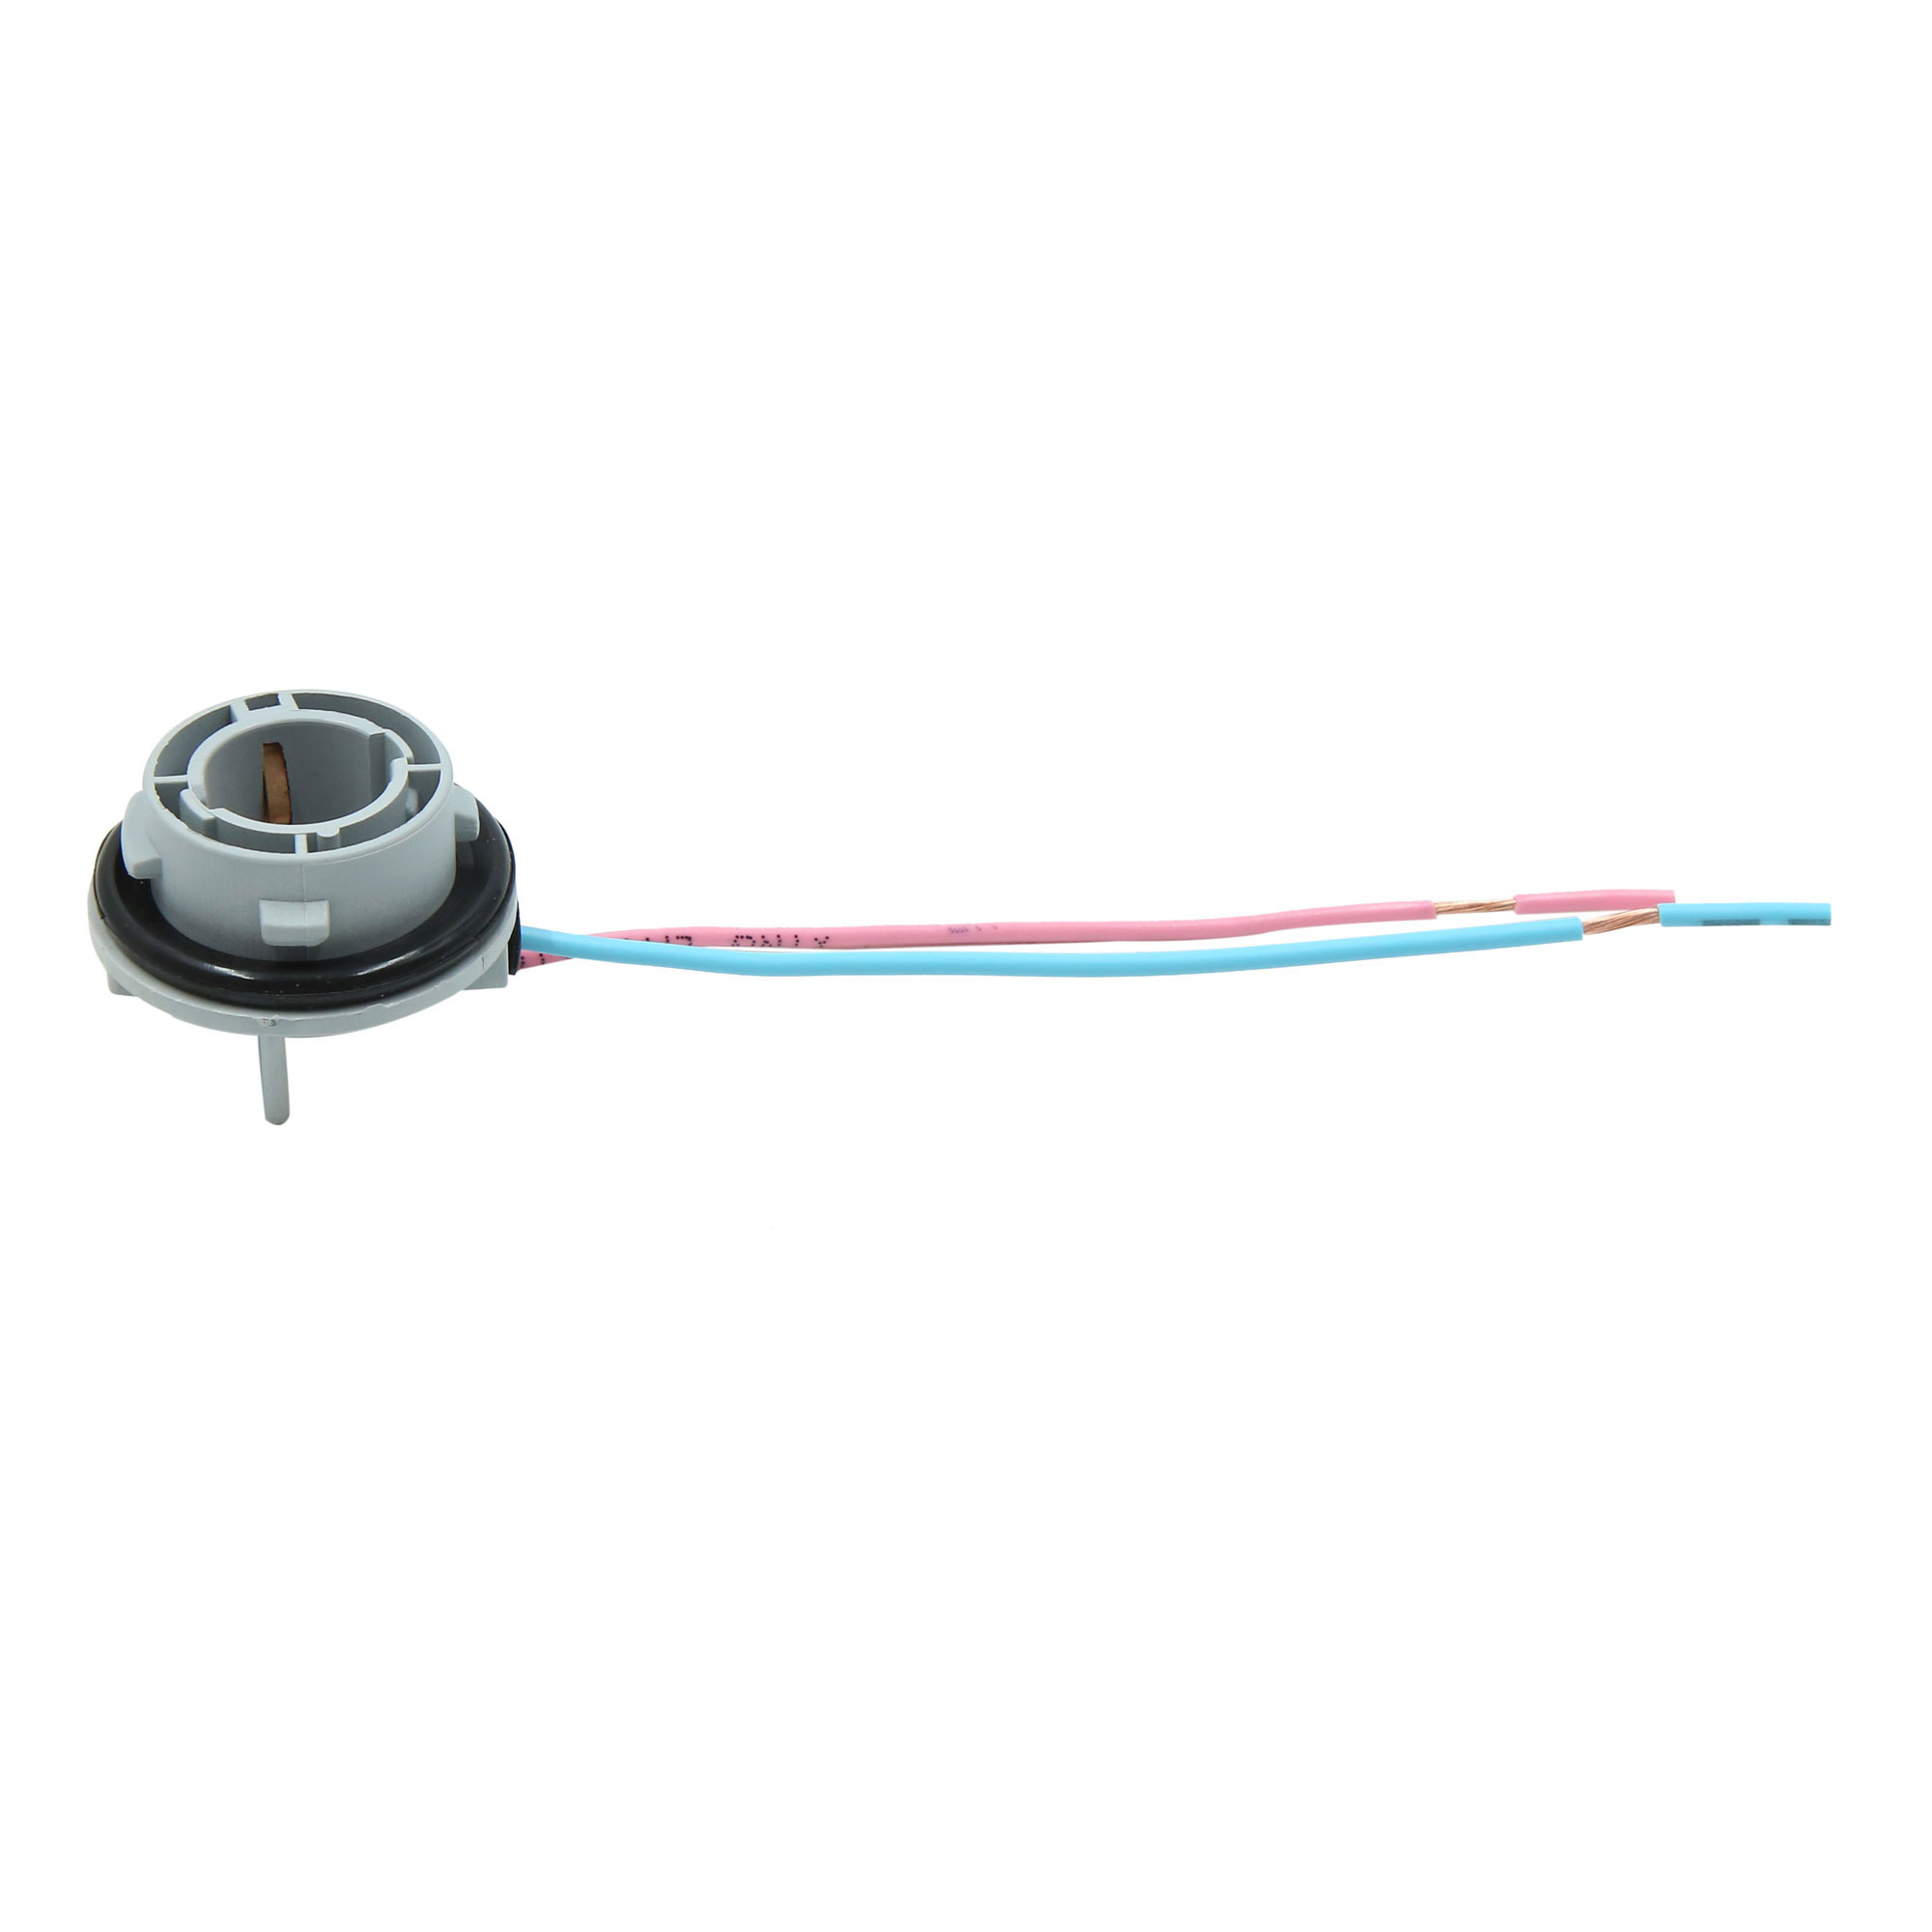 2pcs DC 12V Turn Signal Light Lamp Socket Plug Connector Wiring Harness for Car - image 1 de 5